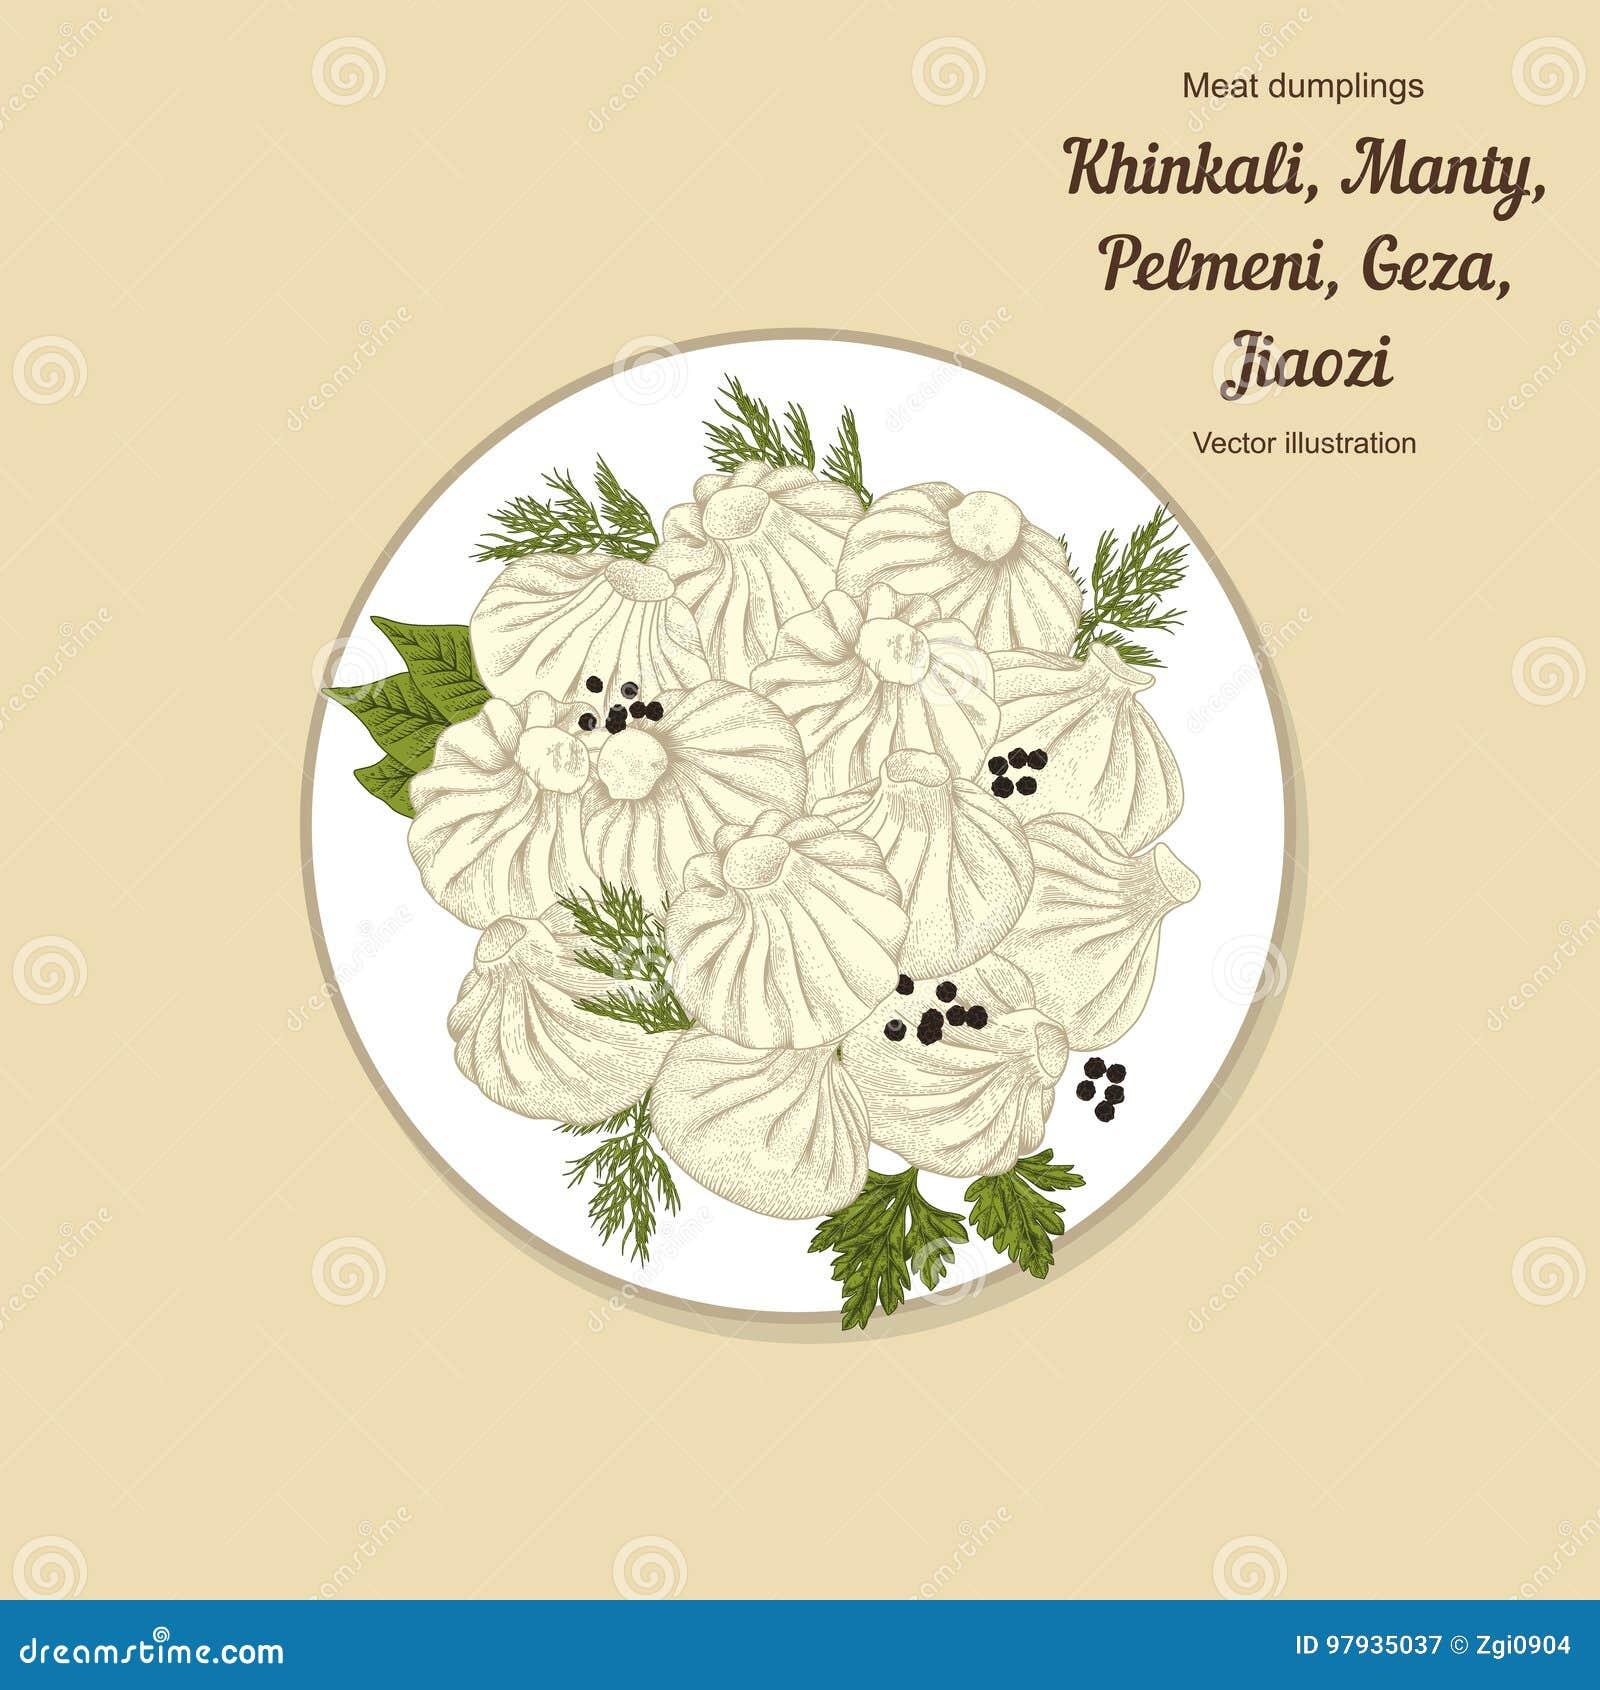 Kinkali, manti, Mehlklöße Geza, Jiaozi Pelmeni Russisches pelmeni auf einer Platte Nahrung Pelmeni Russisches pelmeni auf einer P